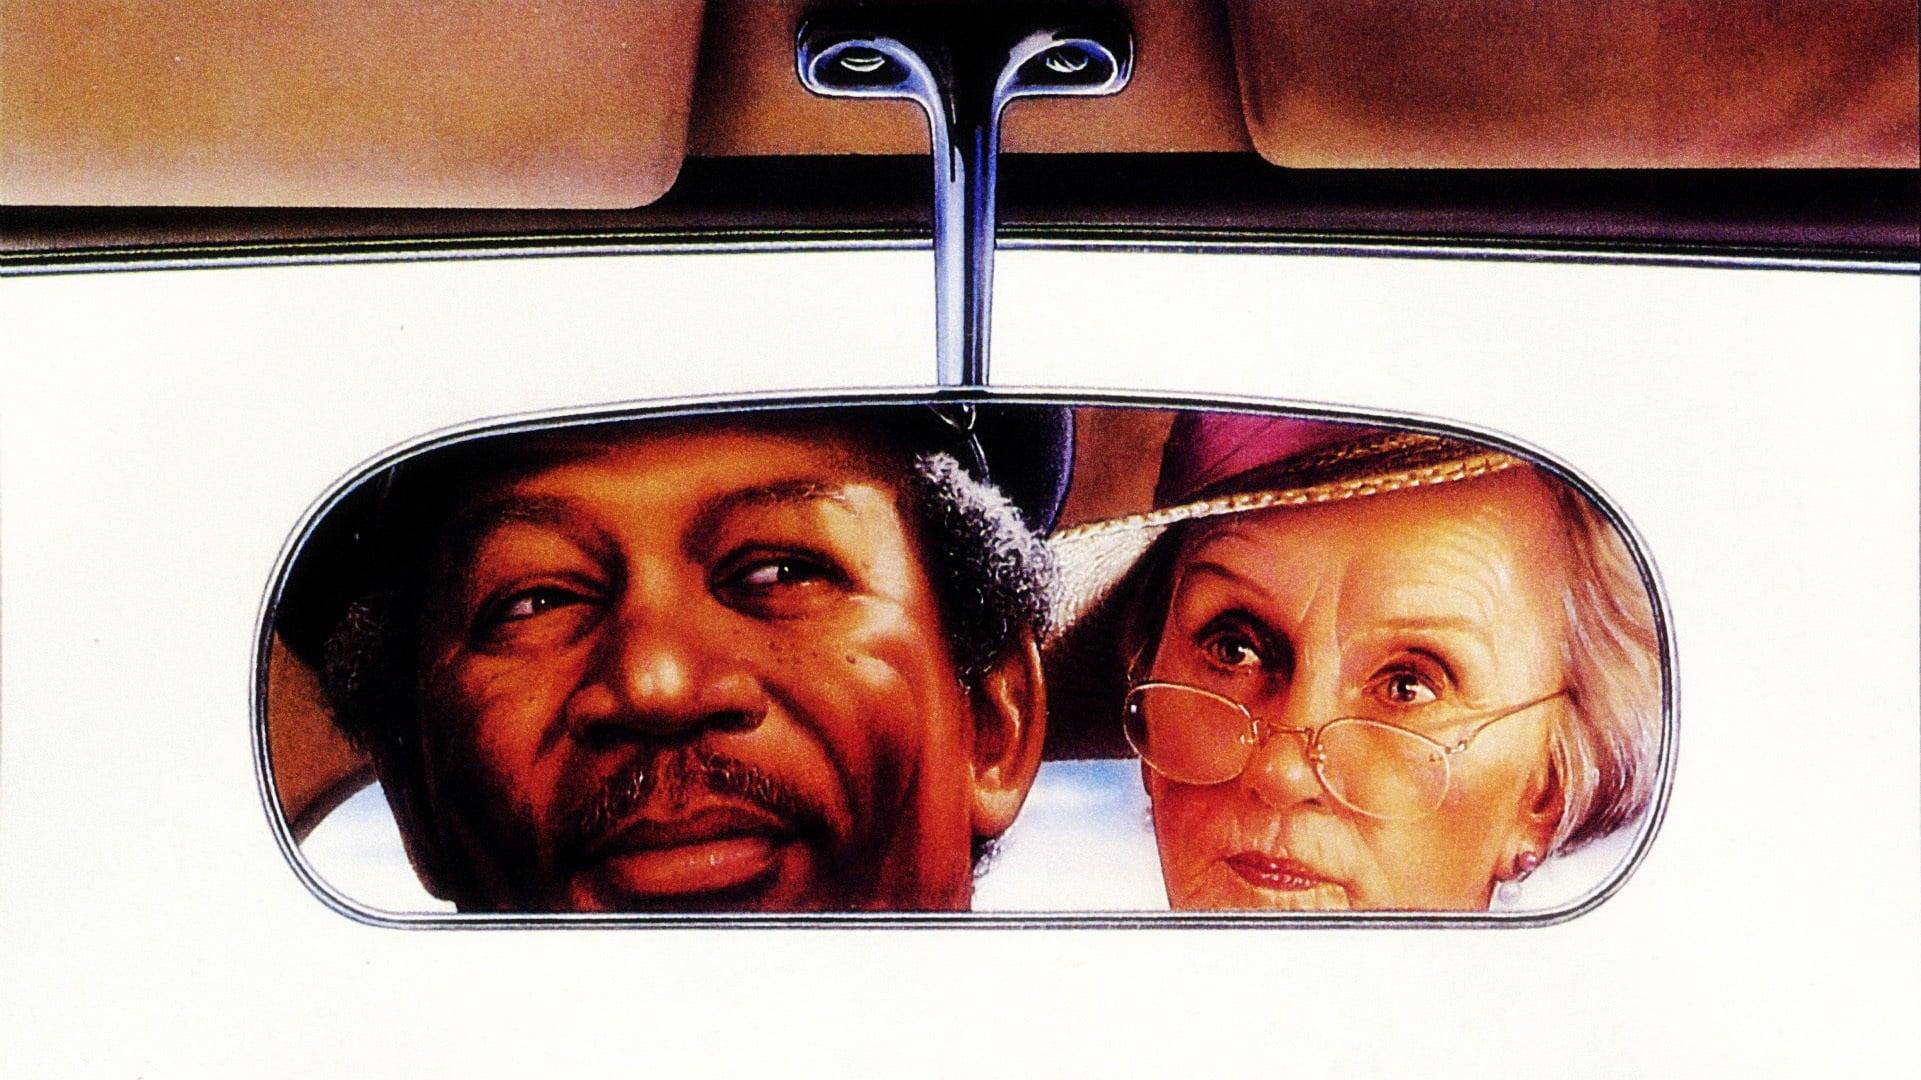 driving miss daisy notes 13031999 atlantan miss daisy werthan (jessica tandy) is a 'fine, rich, jewish lady,' says her black chauffeur, hoke coburn (morgan freeman) driving miss daisy is.